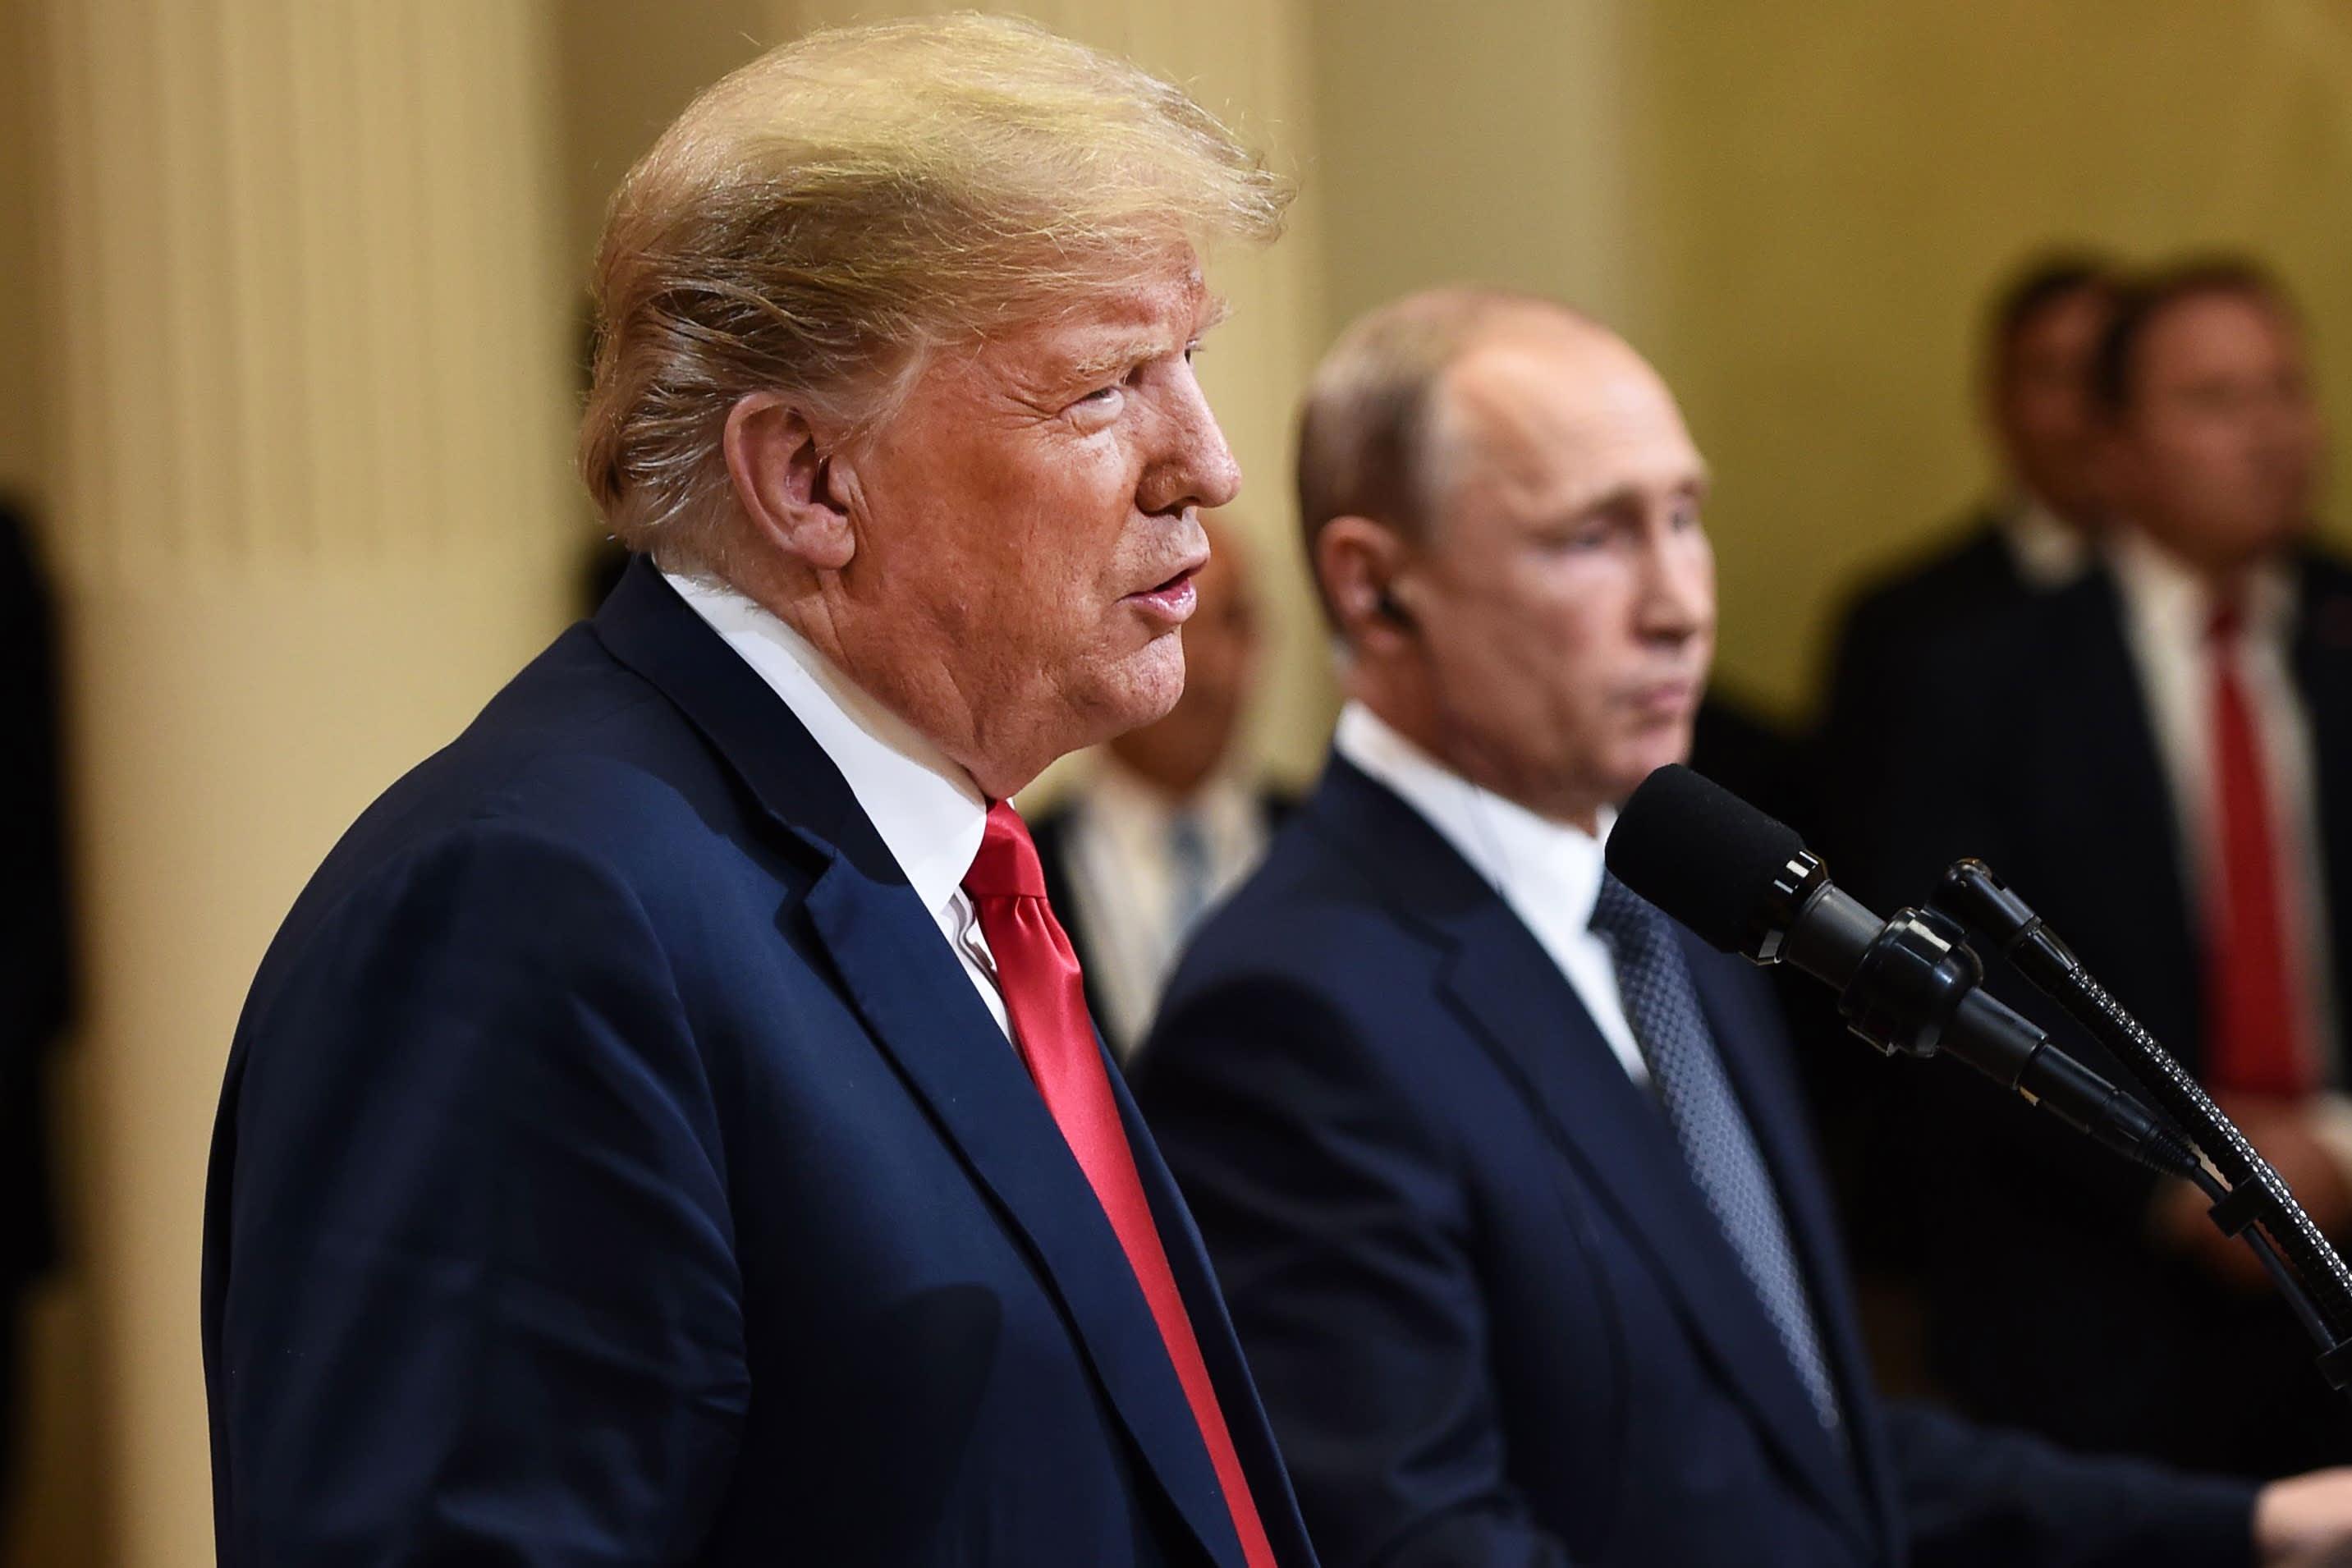 'Very dangerous': Putin, Trump want to weaken the European Union, top EU official says